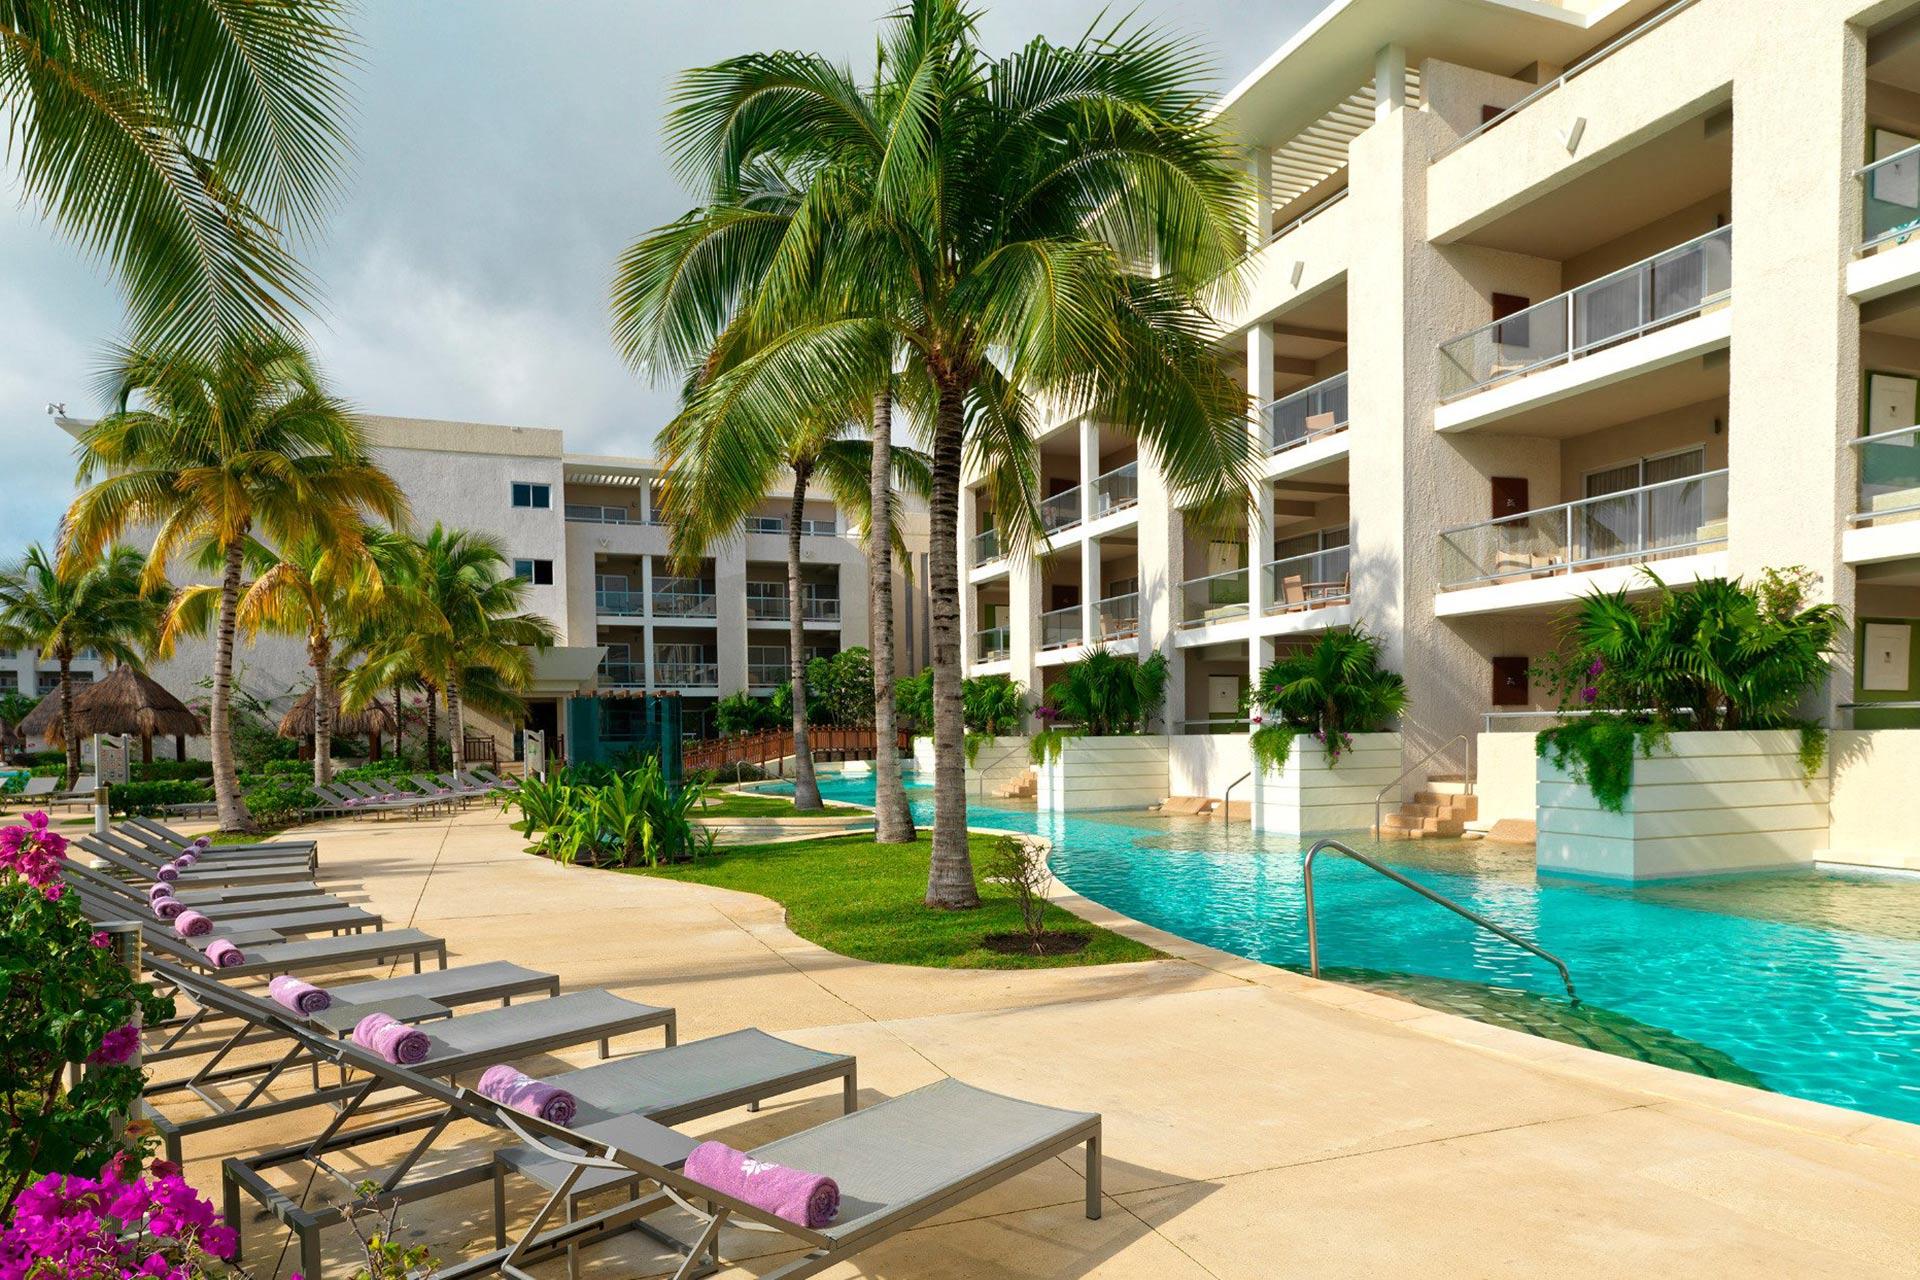 Swim-Up Suites at Paradisus Playa del Carmen La Esmeralda